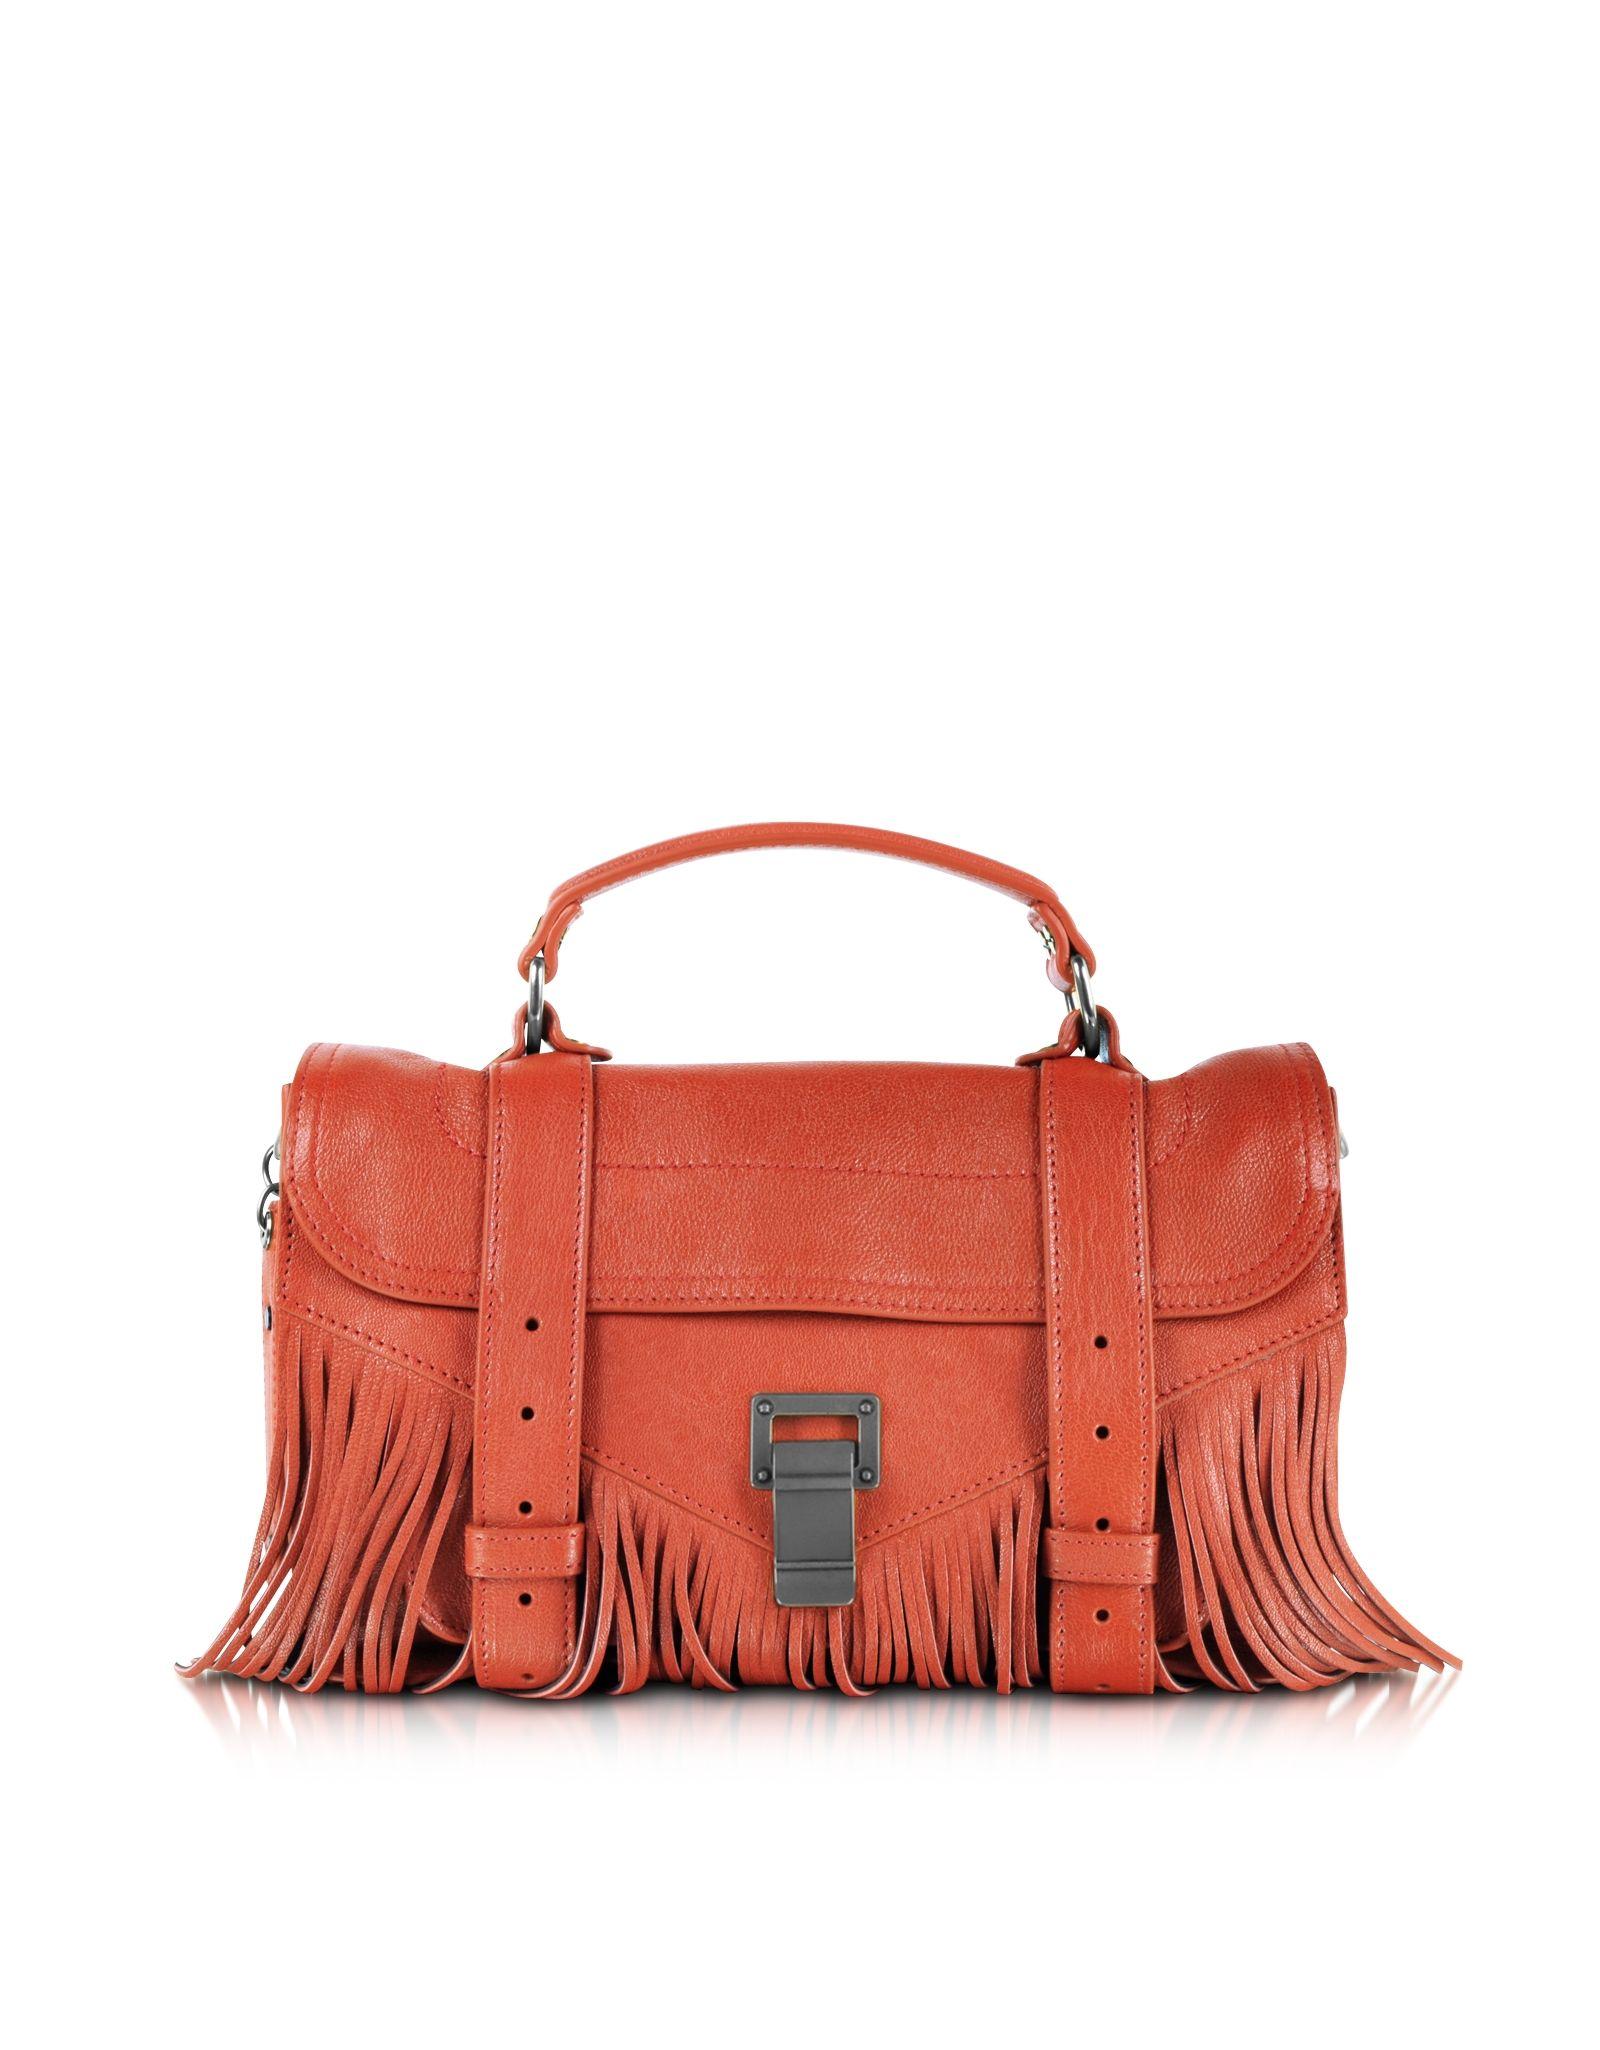 611a6a44e6da Proenza Schouler PS1 Fringe Tiny Dark Orange Crossbody Bag at FORZIERI